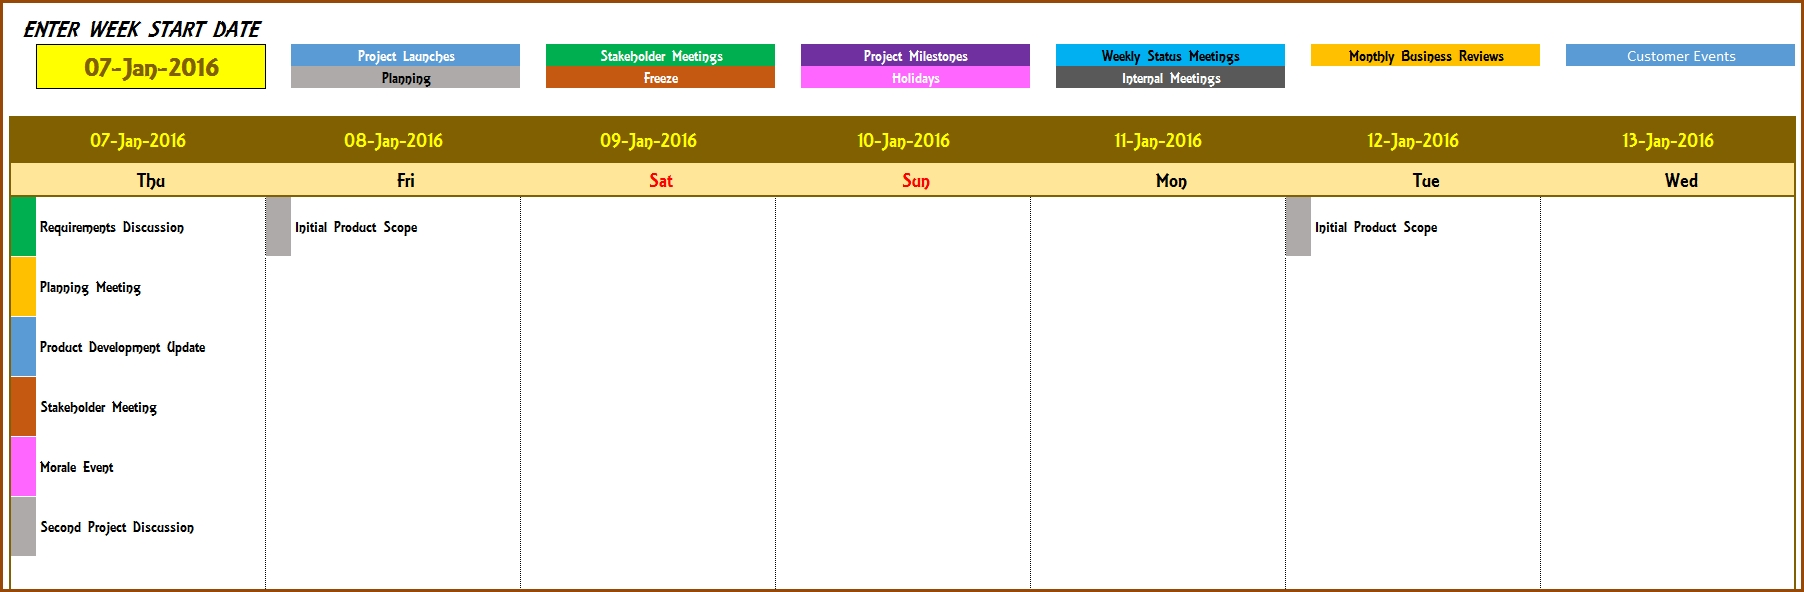 Event Calendar Template 2018 - Tombur.moorddiner.co  Annual Event Calendar Template Excel